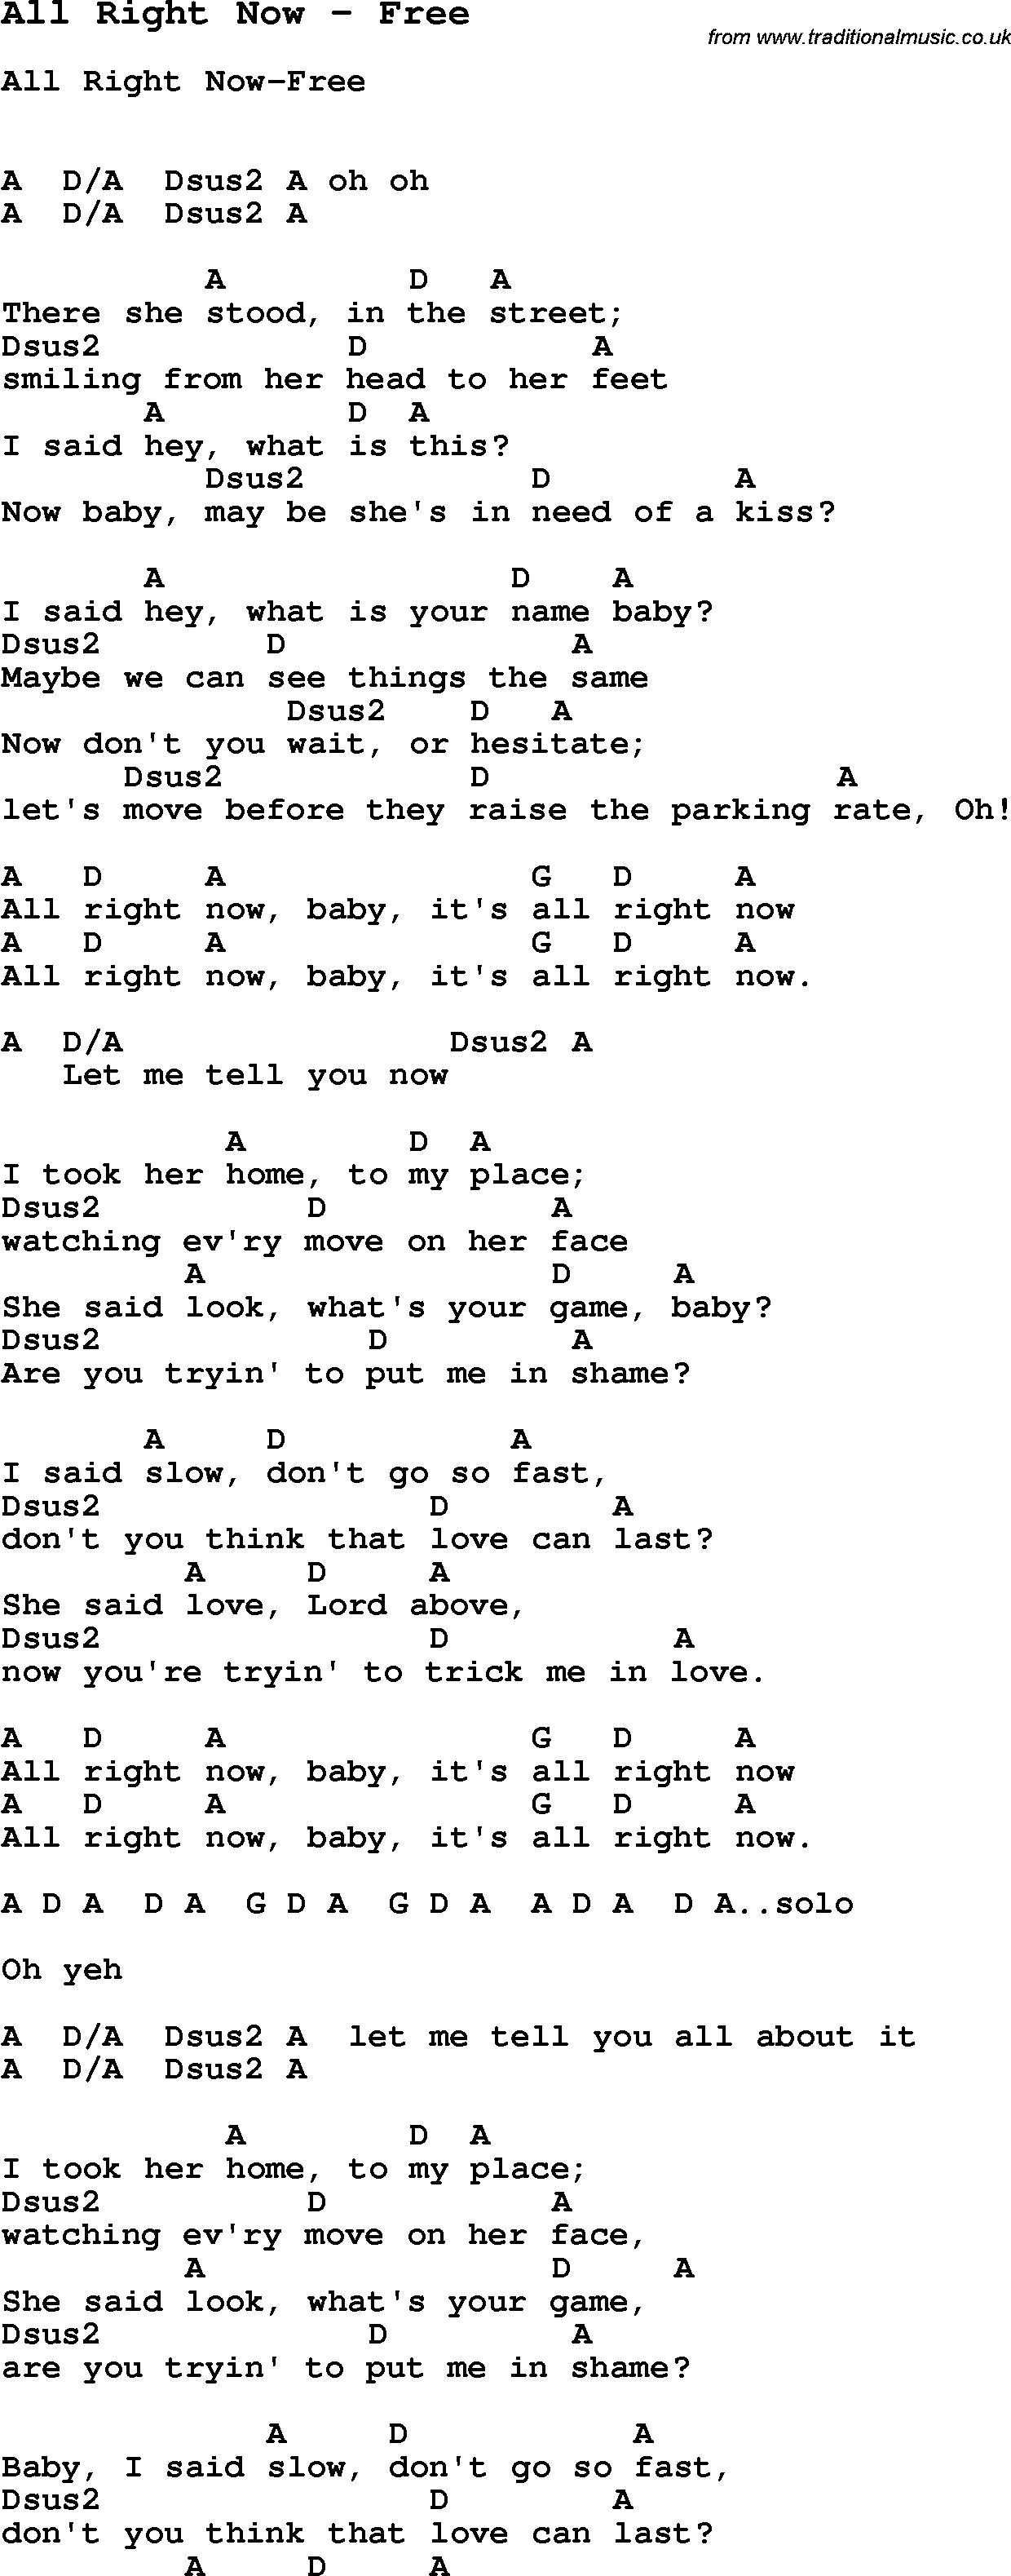 Lyrics of now